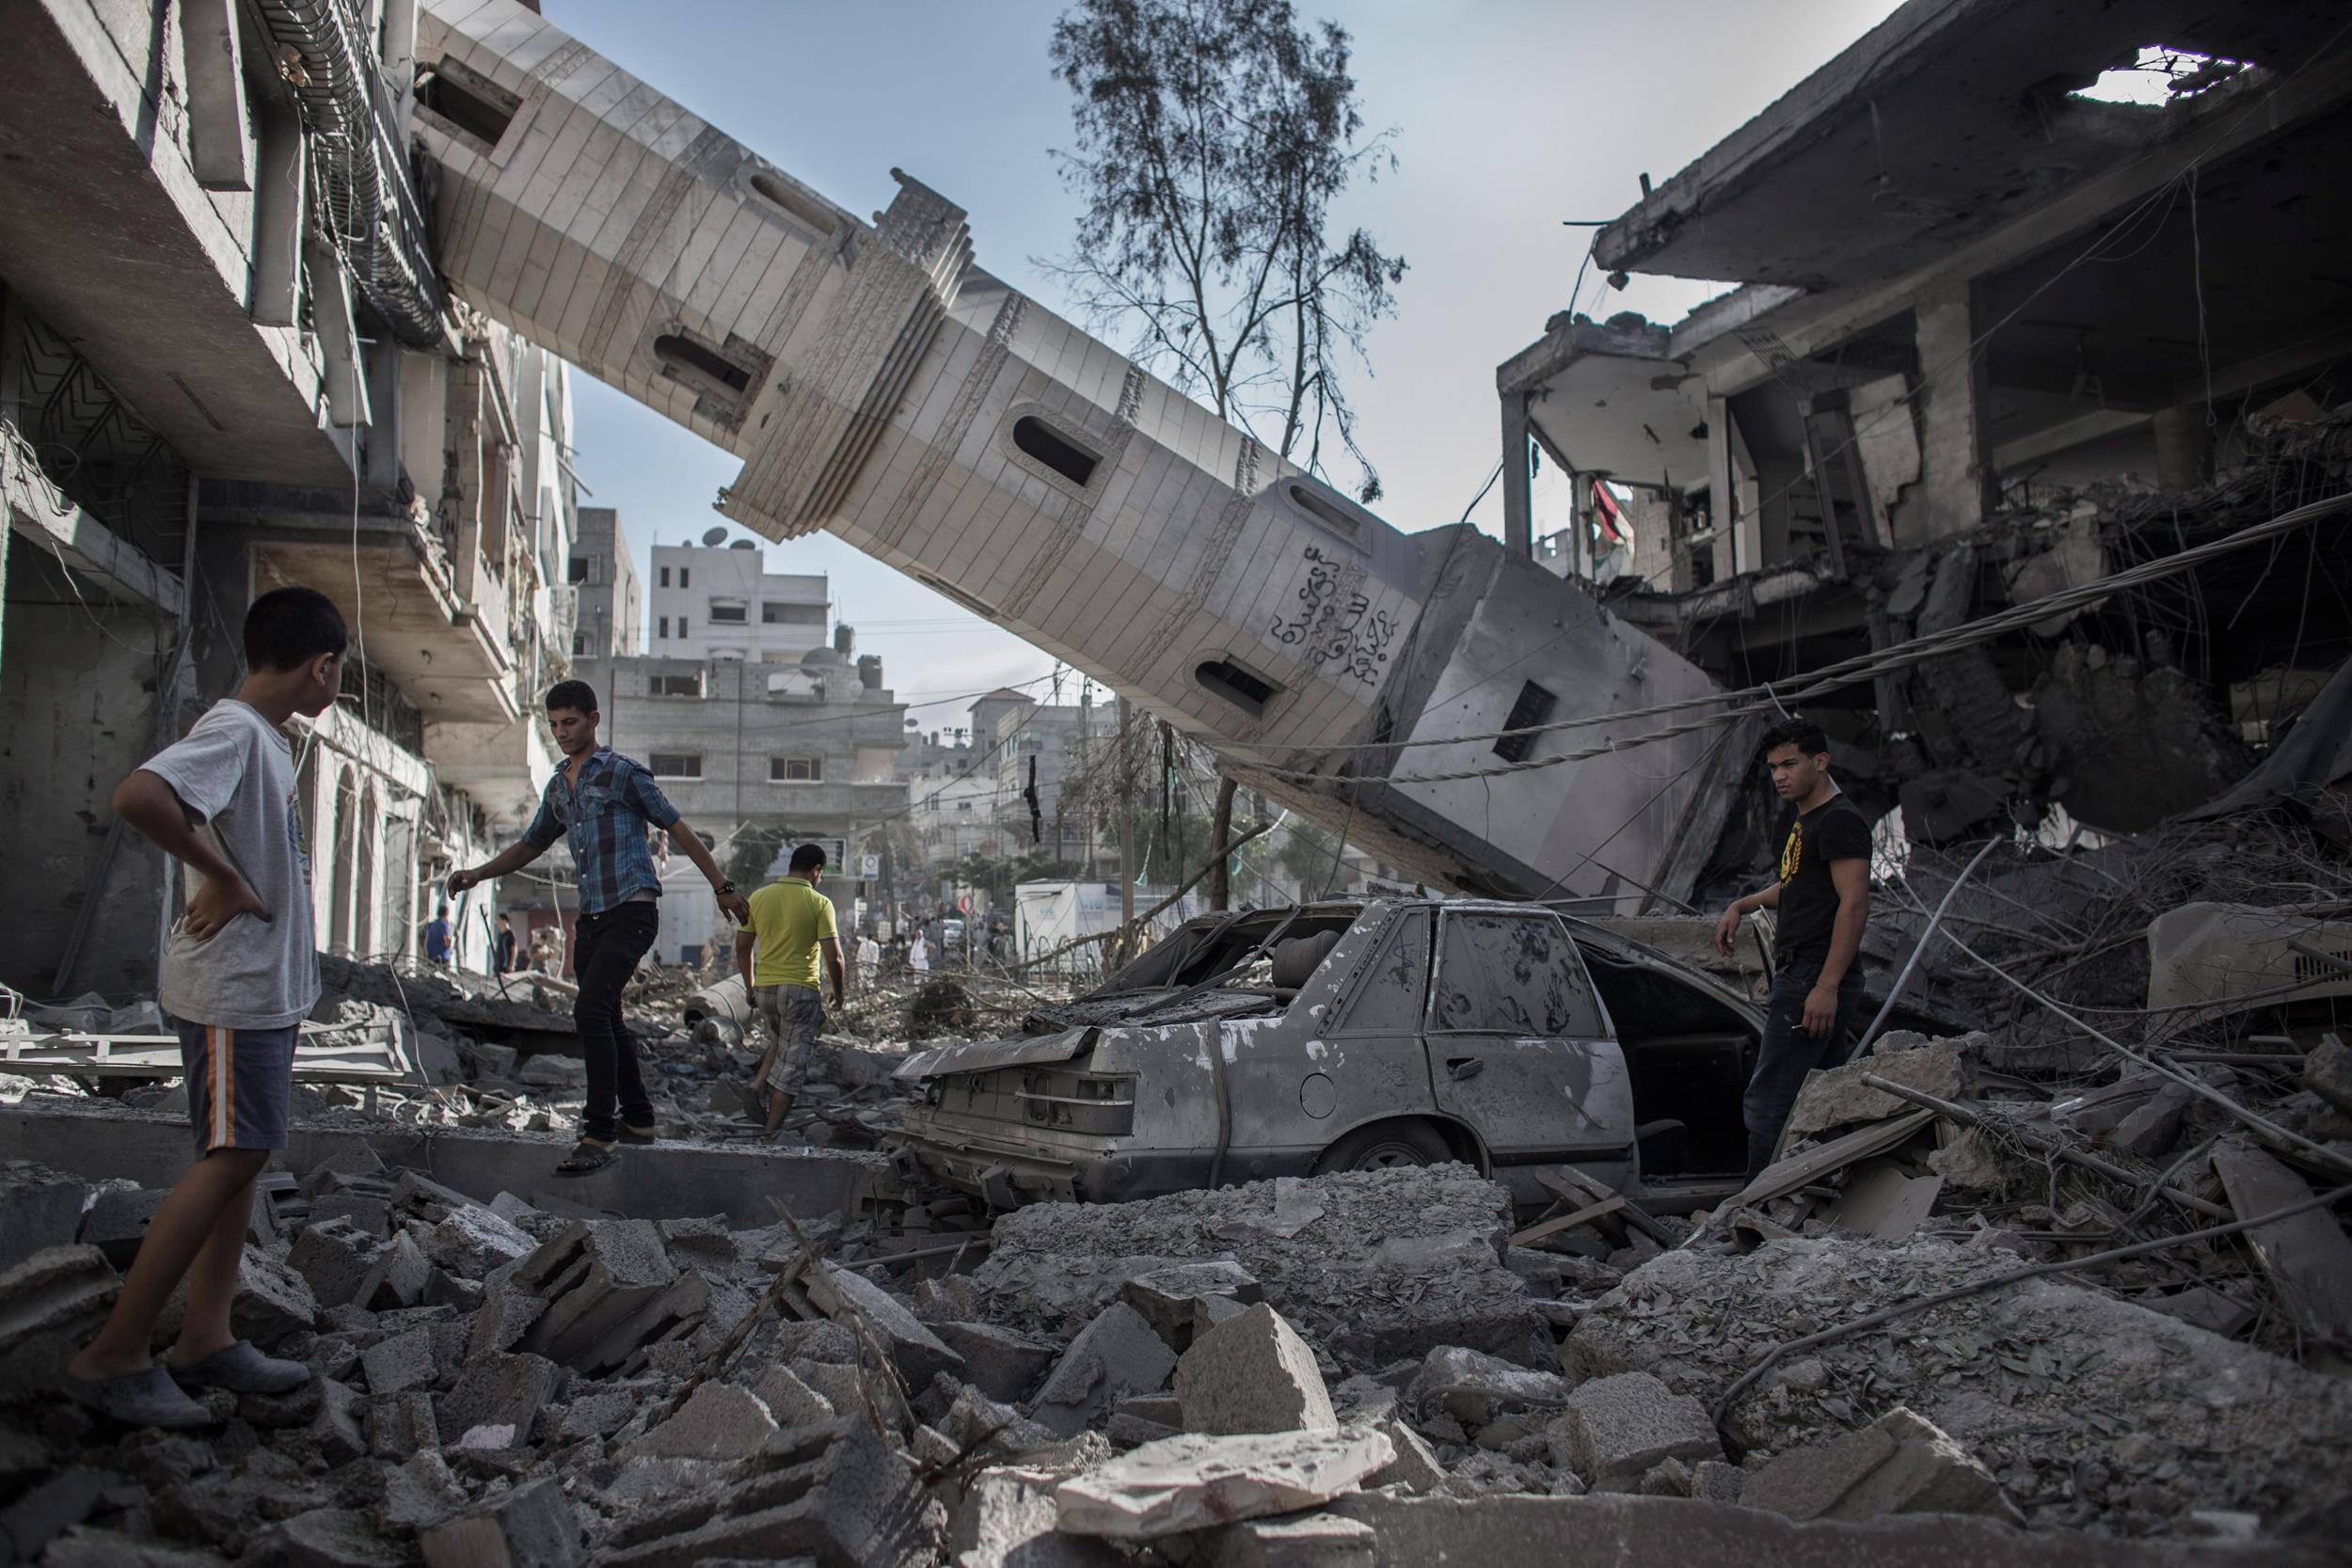 140730-gaza-minaret-toppled-920a_6ebe0a6823b34ee0fdaddf07ed5d99e7